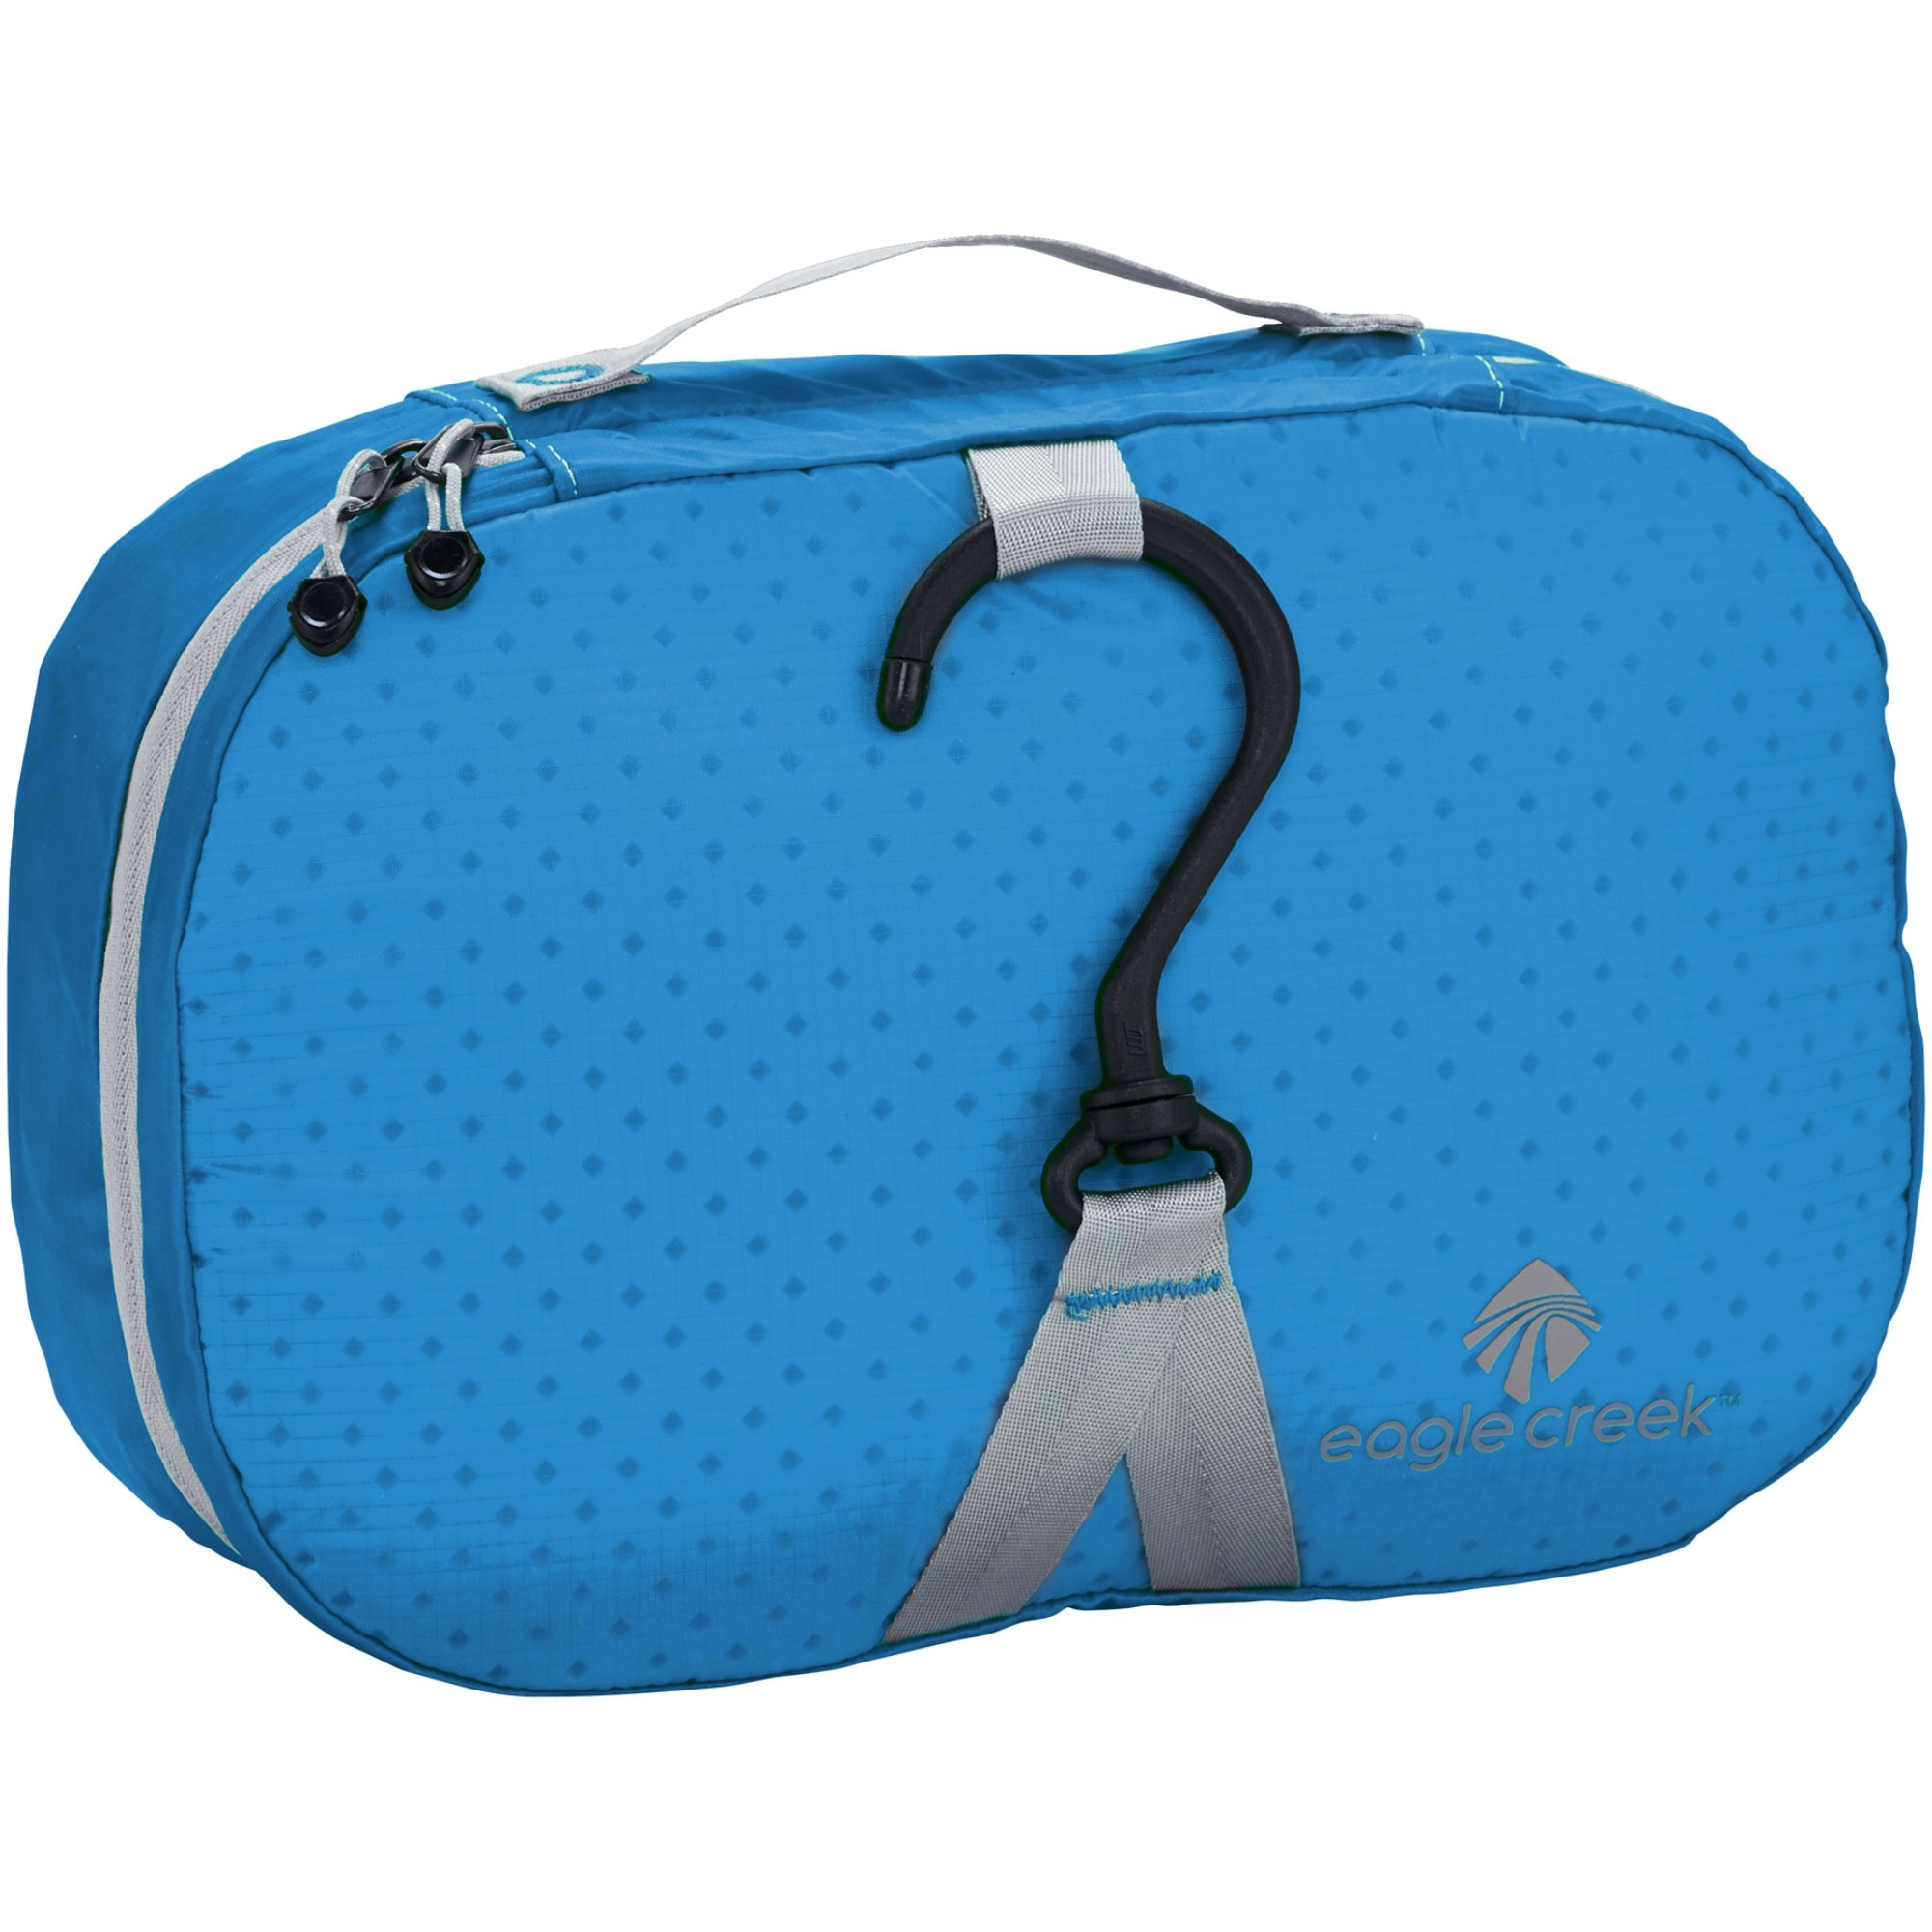 EAGLE CREEK - Specter Wallaby Small Wash Bag - Brilliant Blue